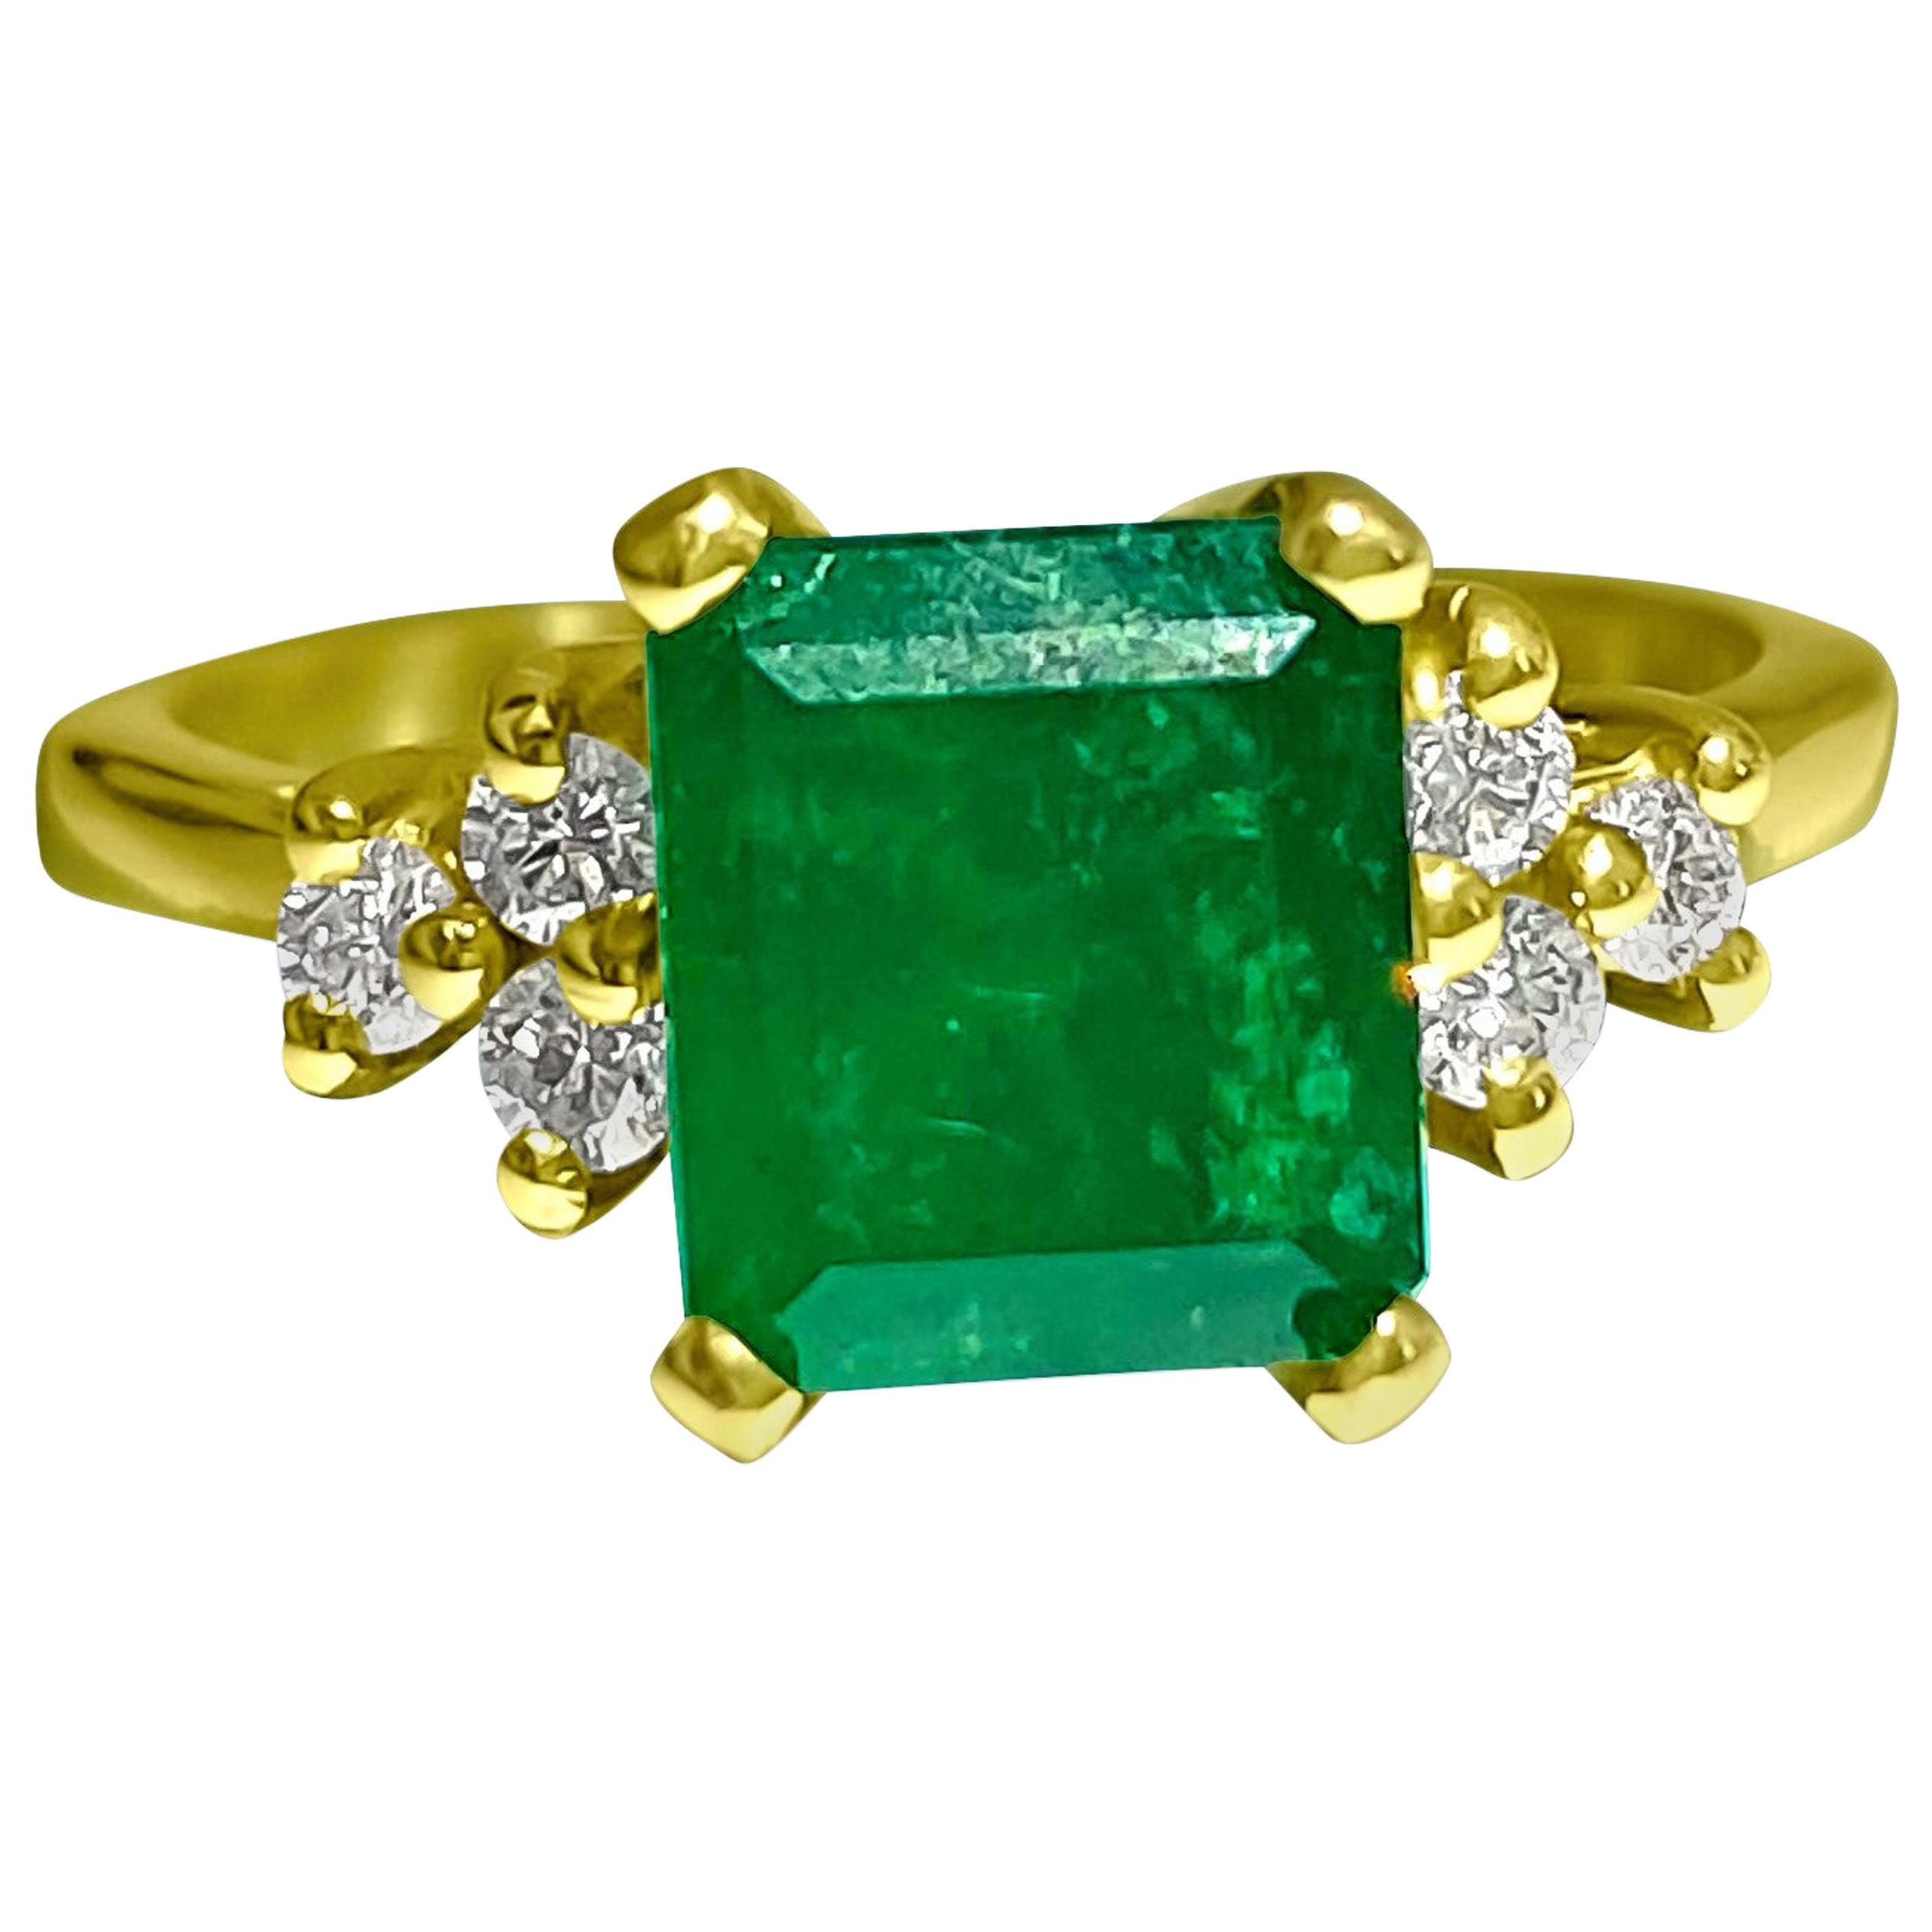 2.50 Carat Natural Colombian Emerald Diamond Cocktail Ring 14 Karat Yellow Gold